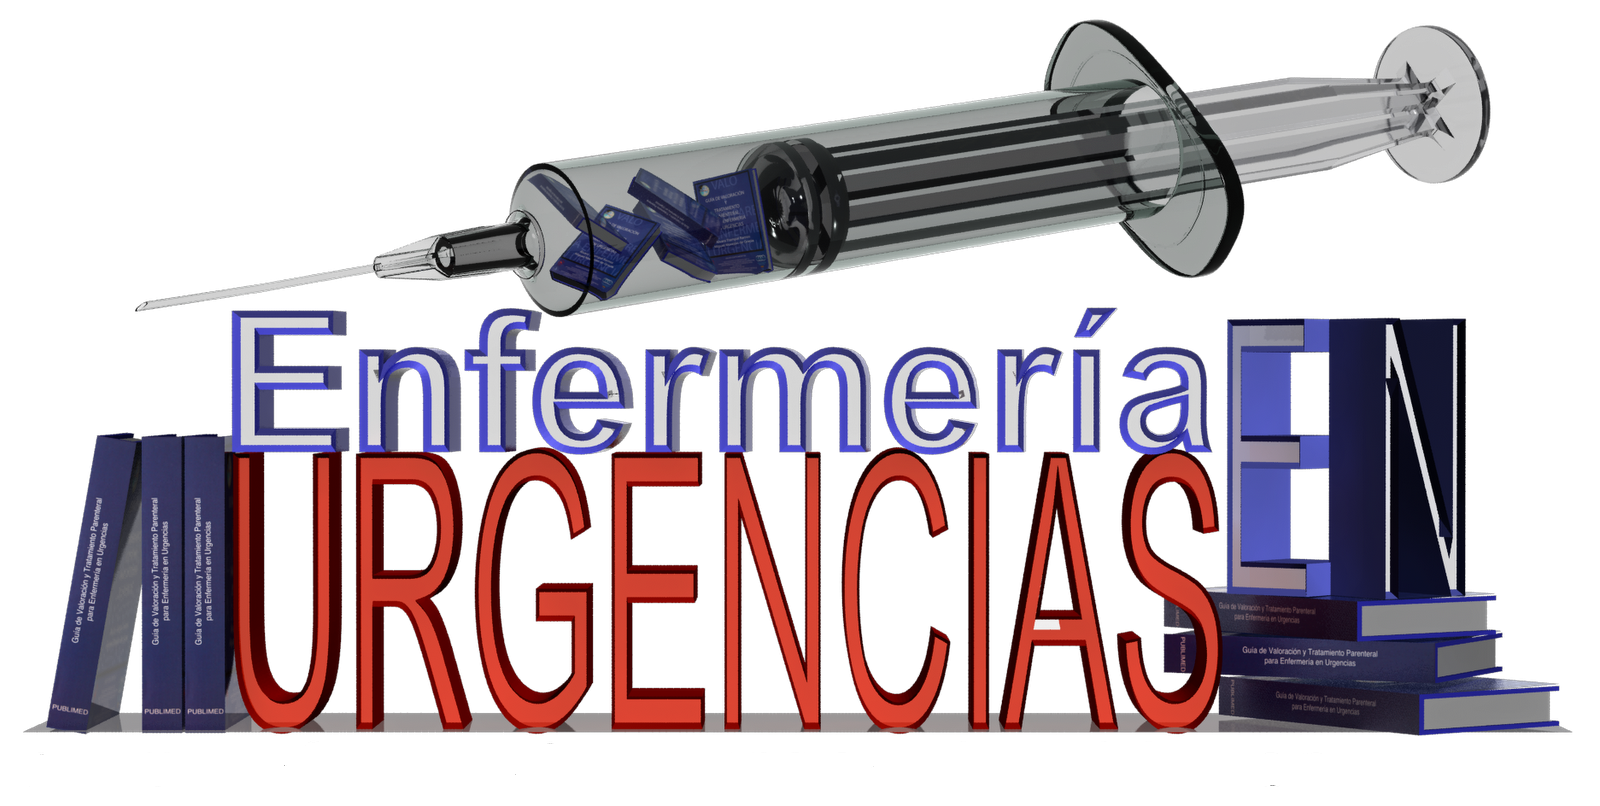 enfermeria the best